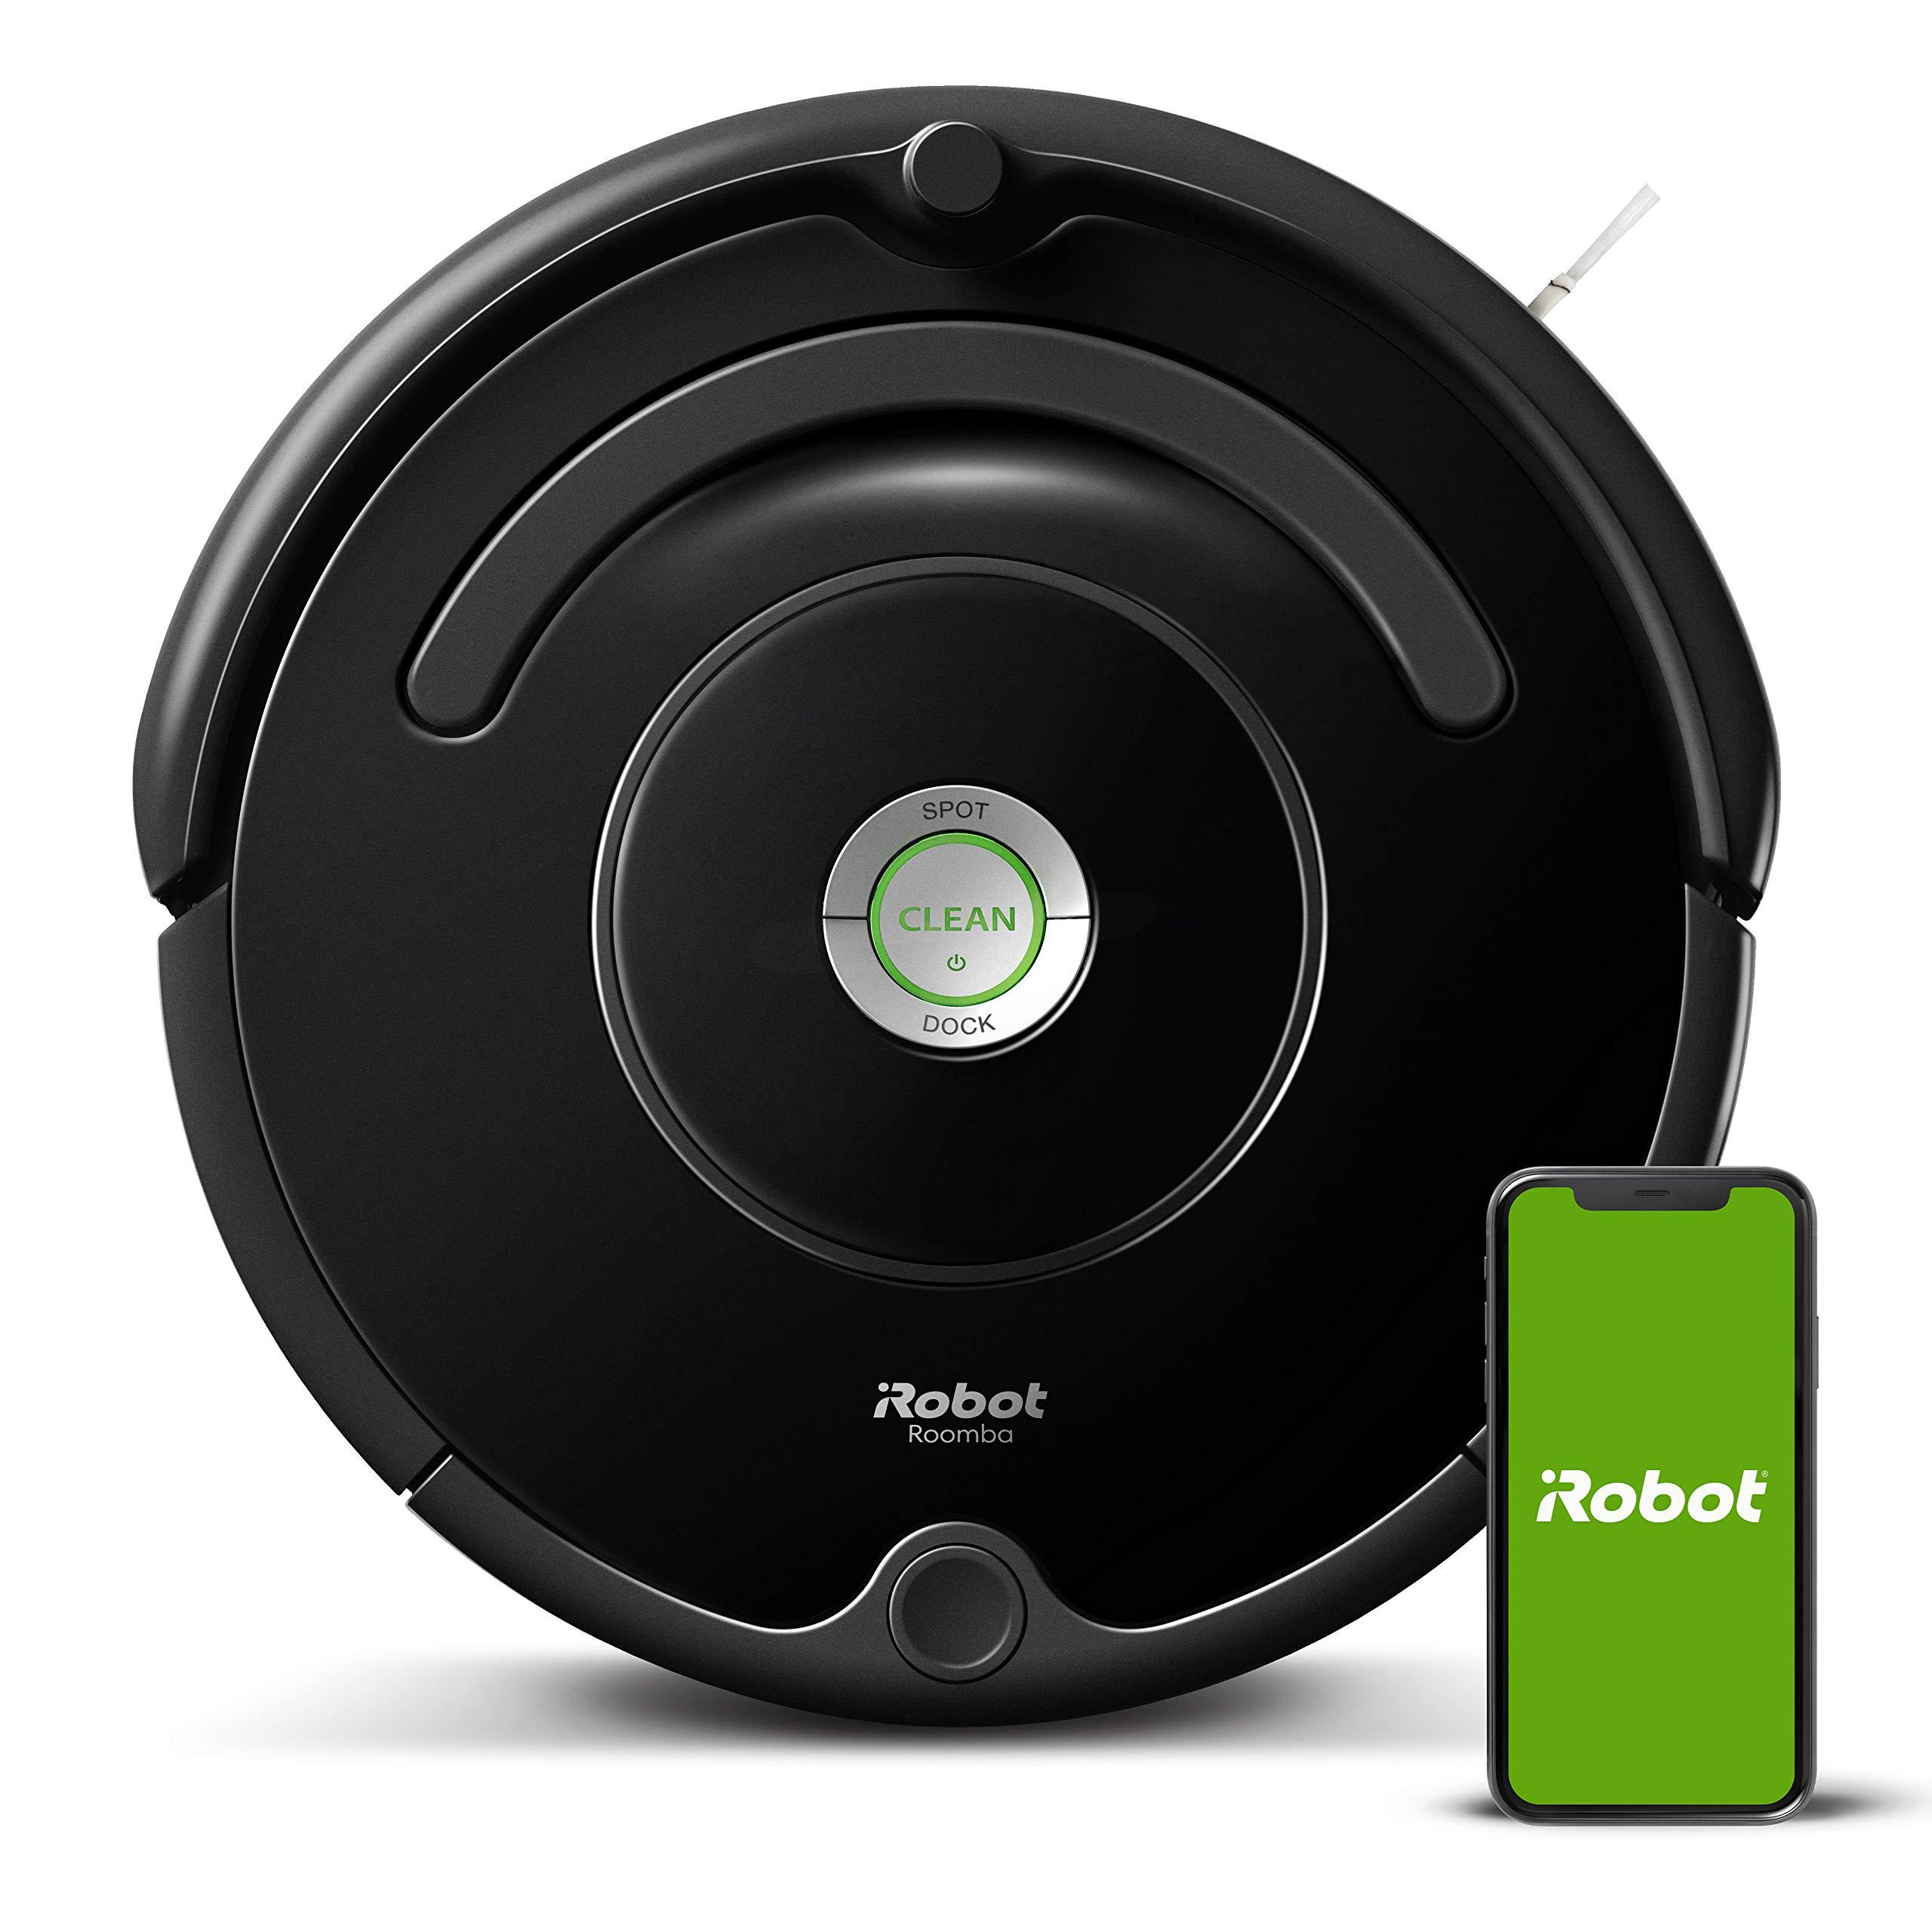 iRobot Roomba 675 Wi-Fi Robot Vacuum for $249 (reg. $279.99)